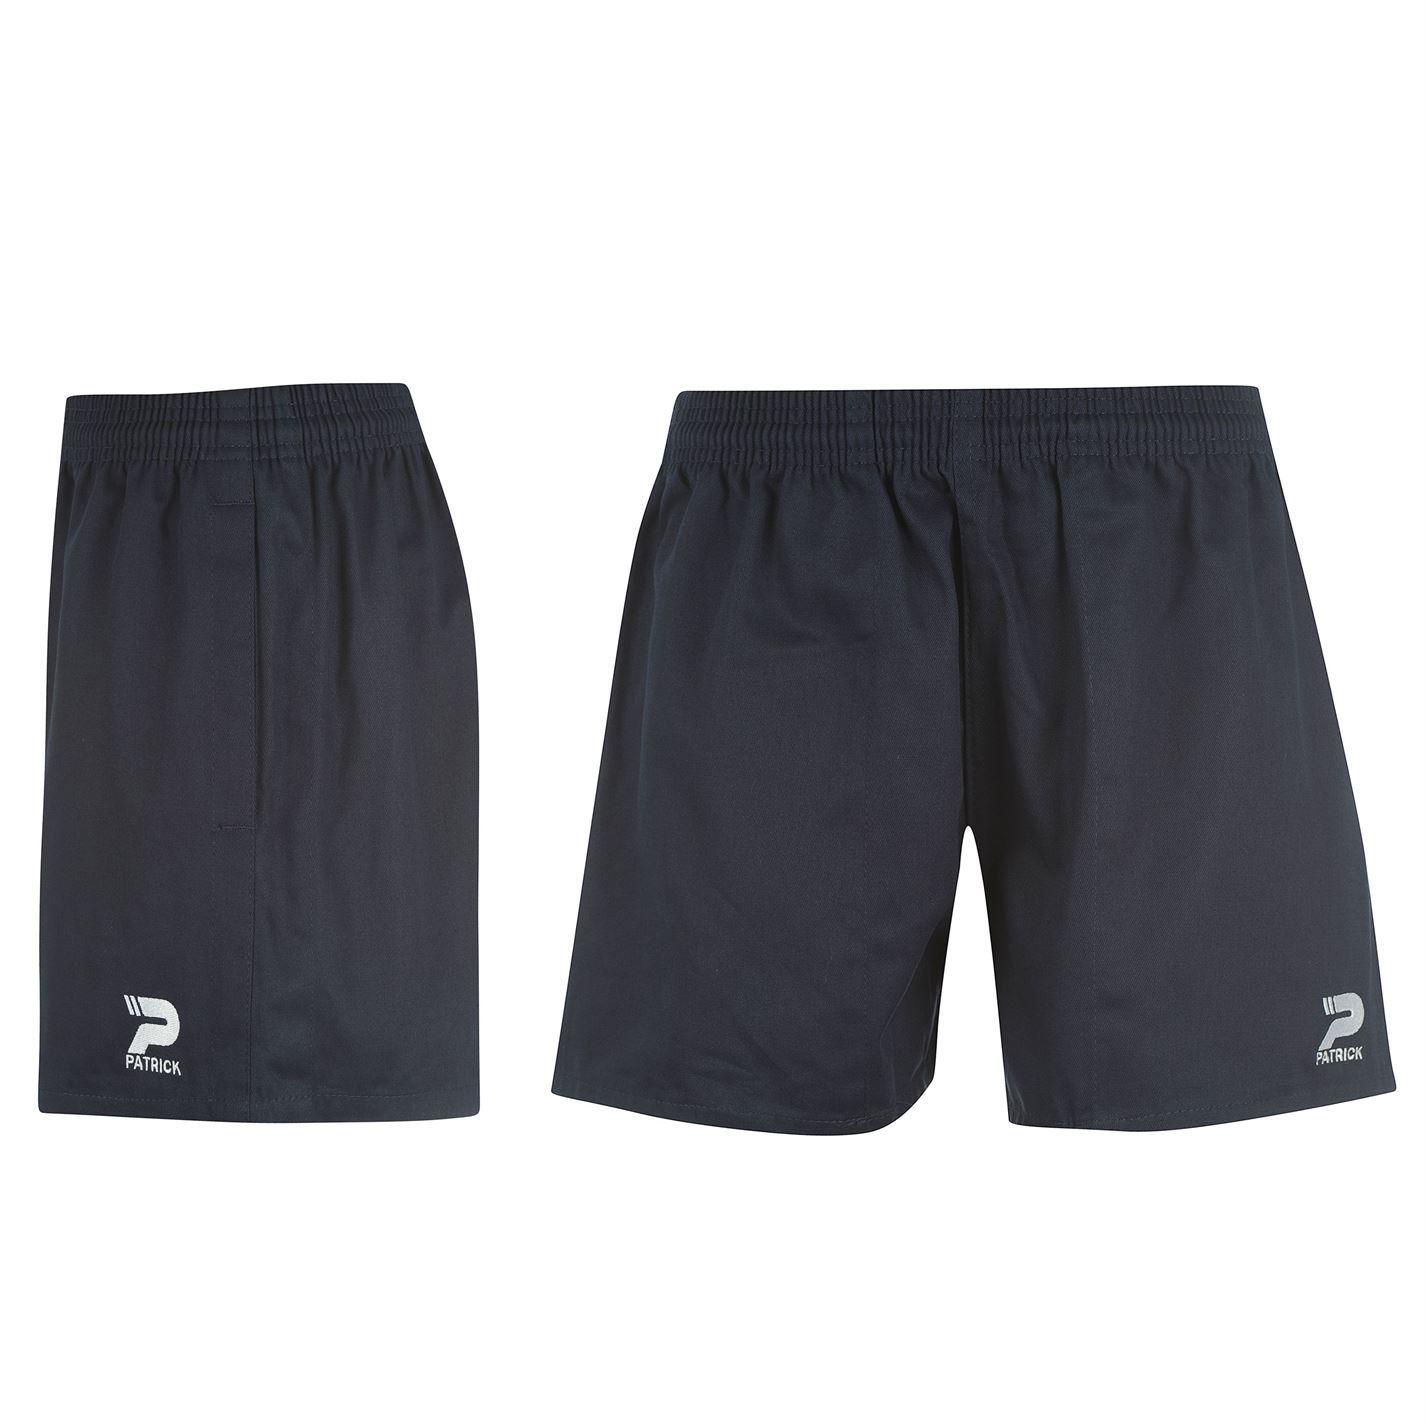 Patrick-Rugby-Shorts-Junior-Boys-Sports-Fan-Bottoms thumbnail 9